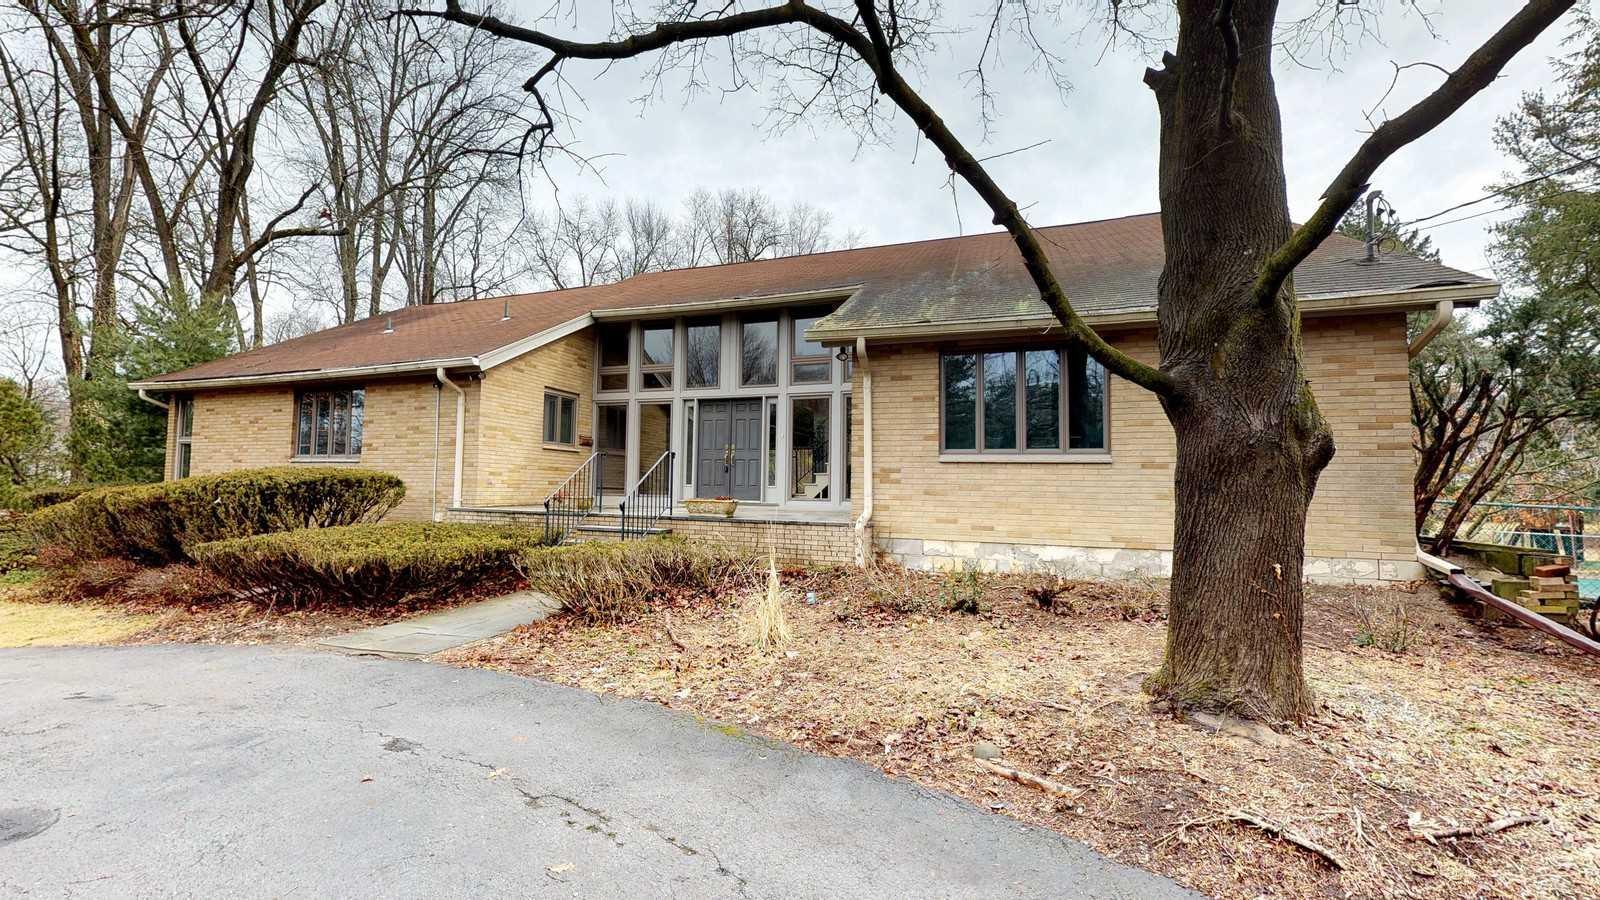 Single Family Home for Sale at 41 YATES BLVD 41 YATES BLVD Poughkeepsie, New York 12601 United States